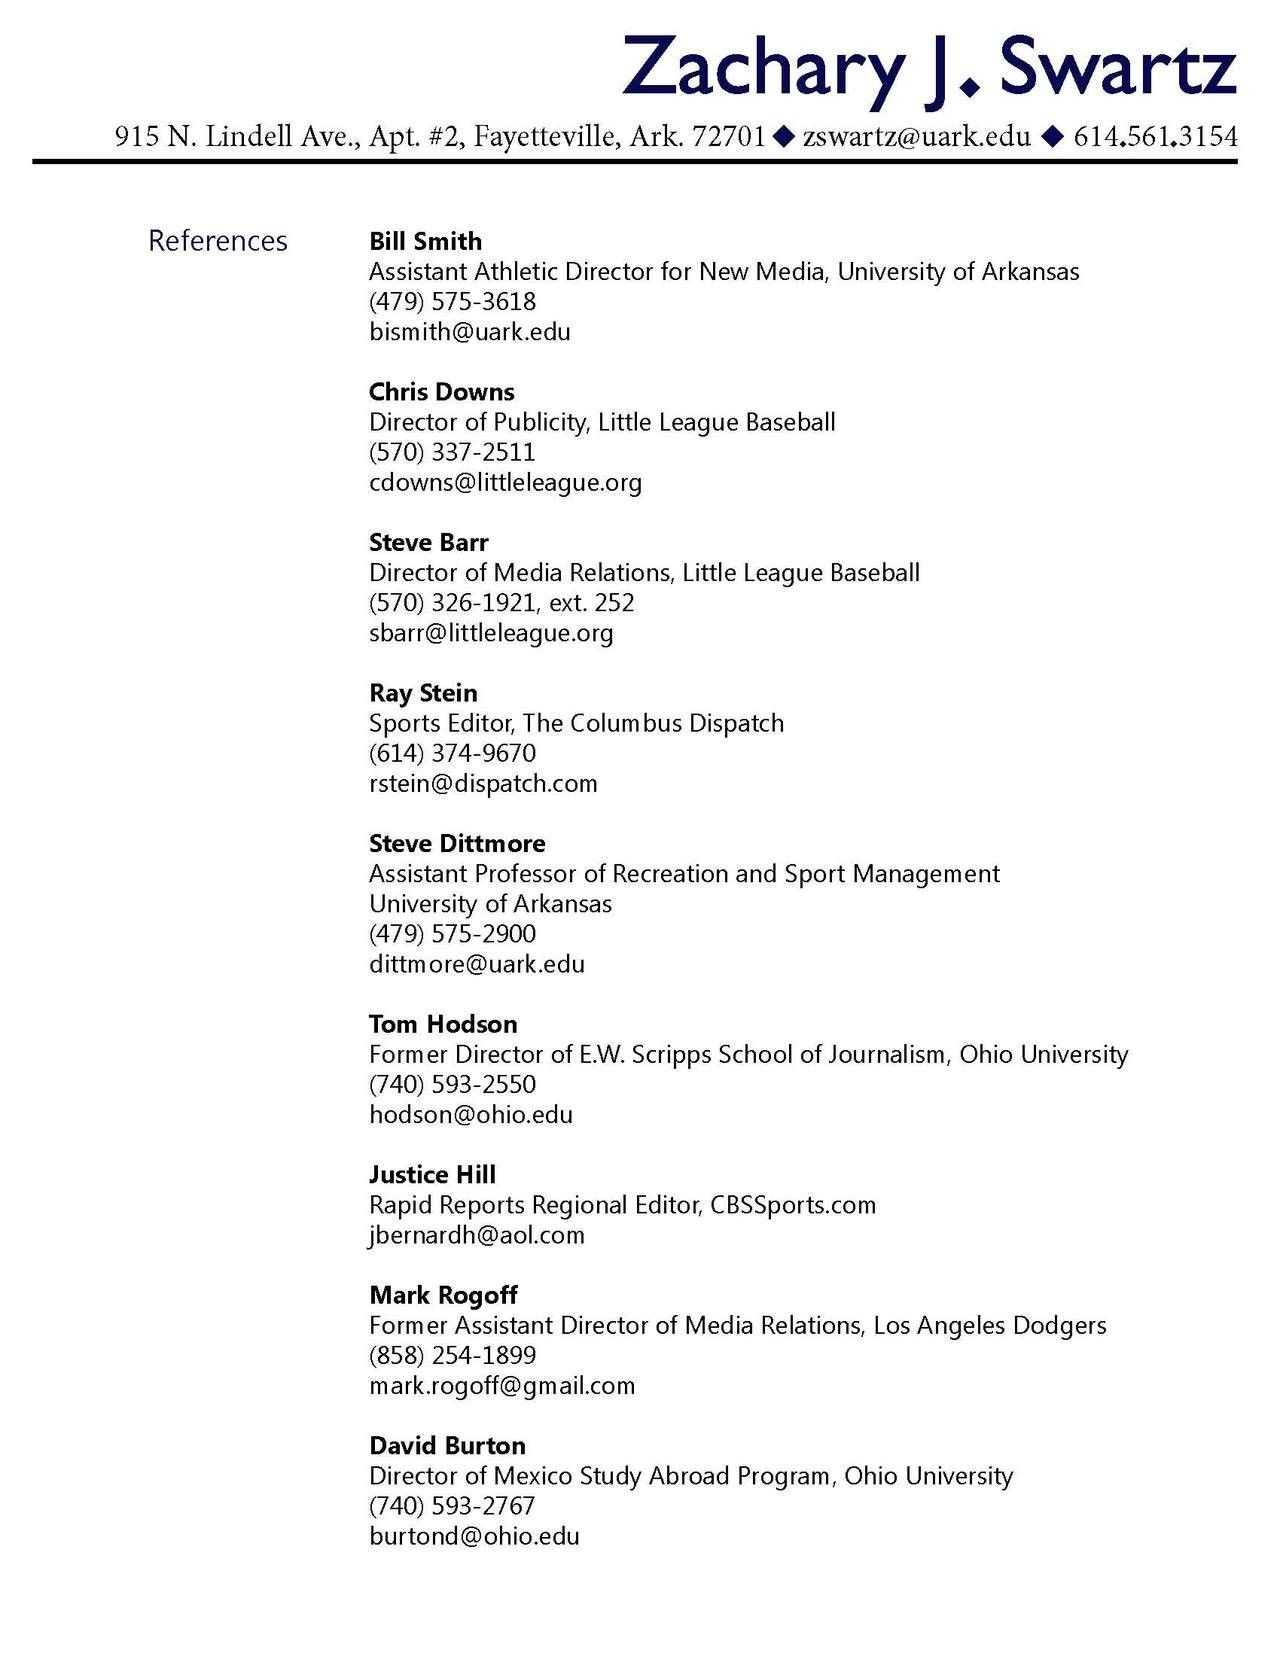 26 Best Font For Cover Letter Resume References Reference Page For Resume Sample Resume Cover Letter